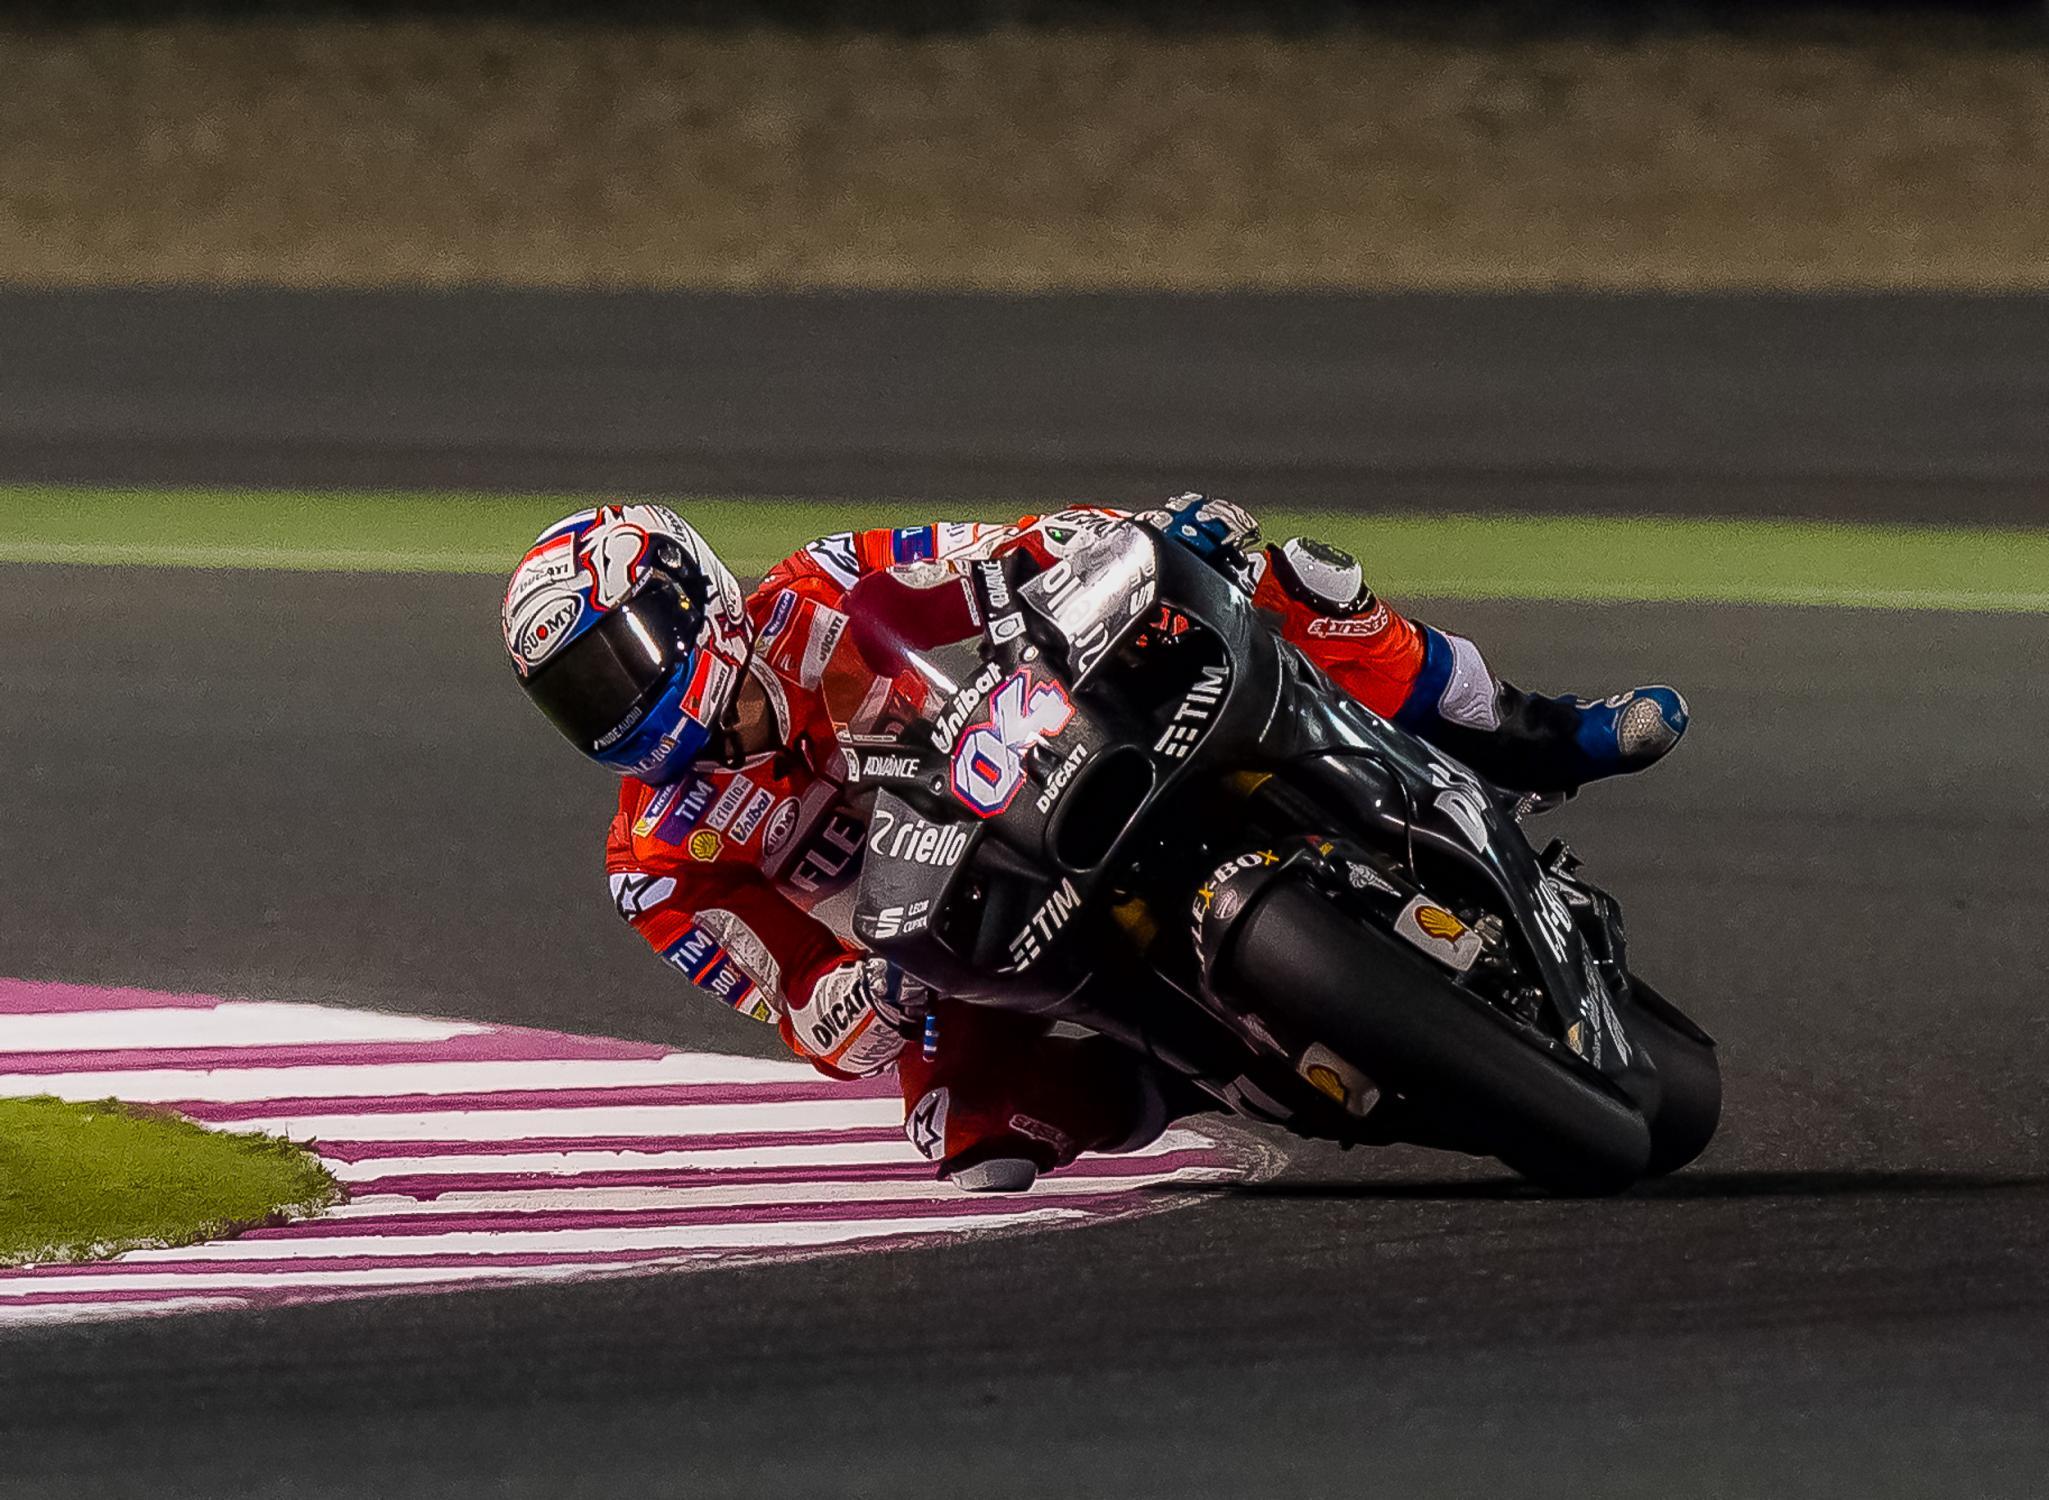 [MotoGP] Test Losail Dsc_8133.gallery_full_top_fullscreen